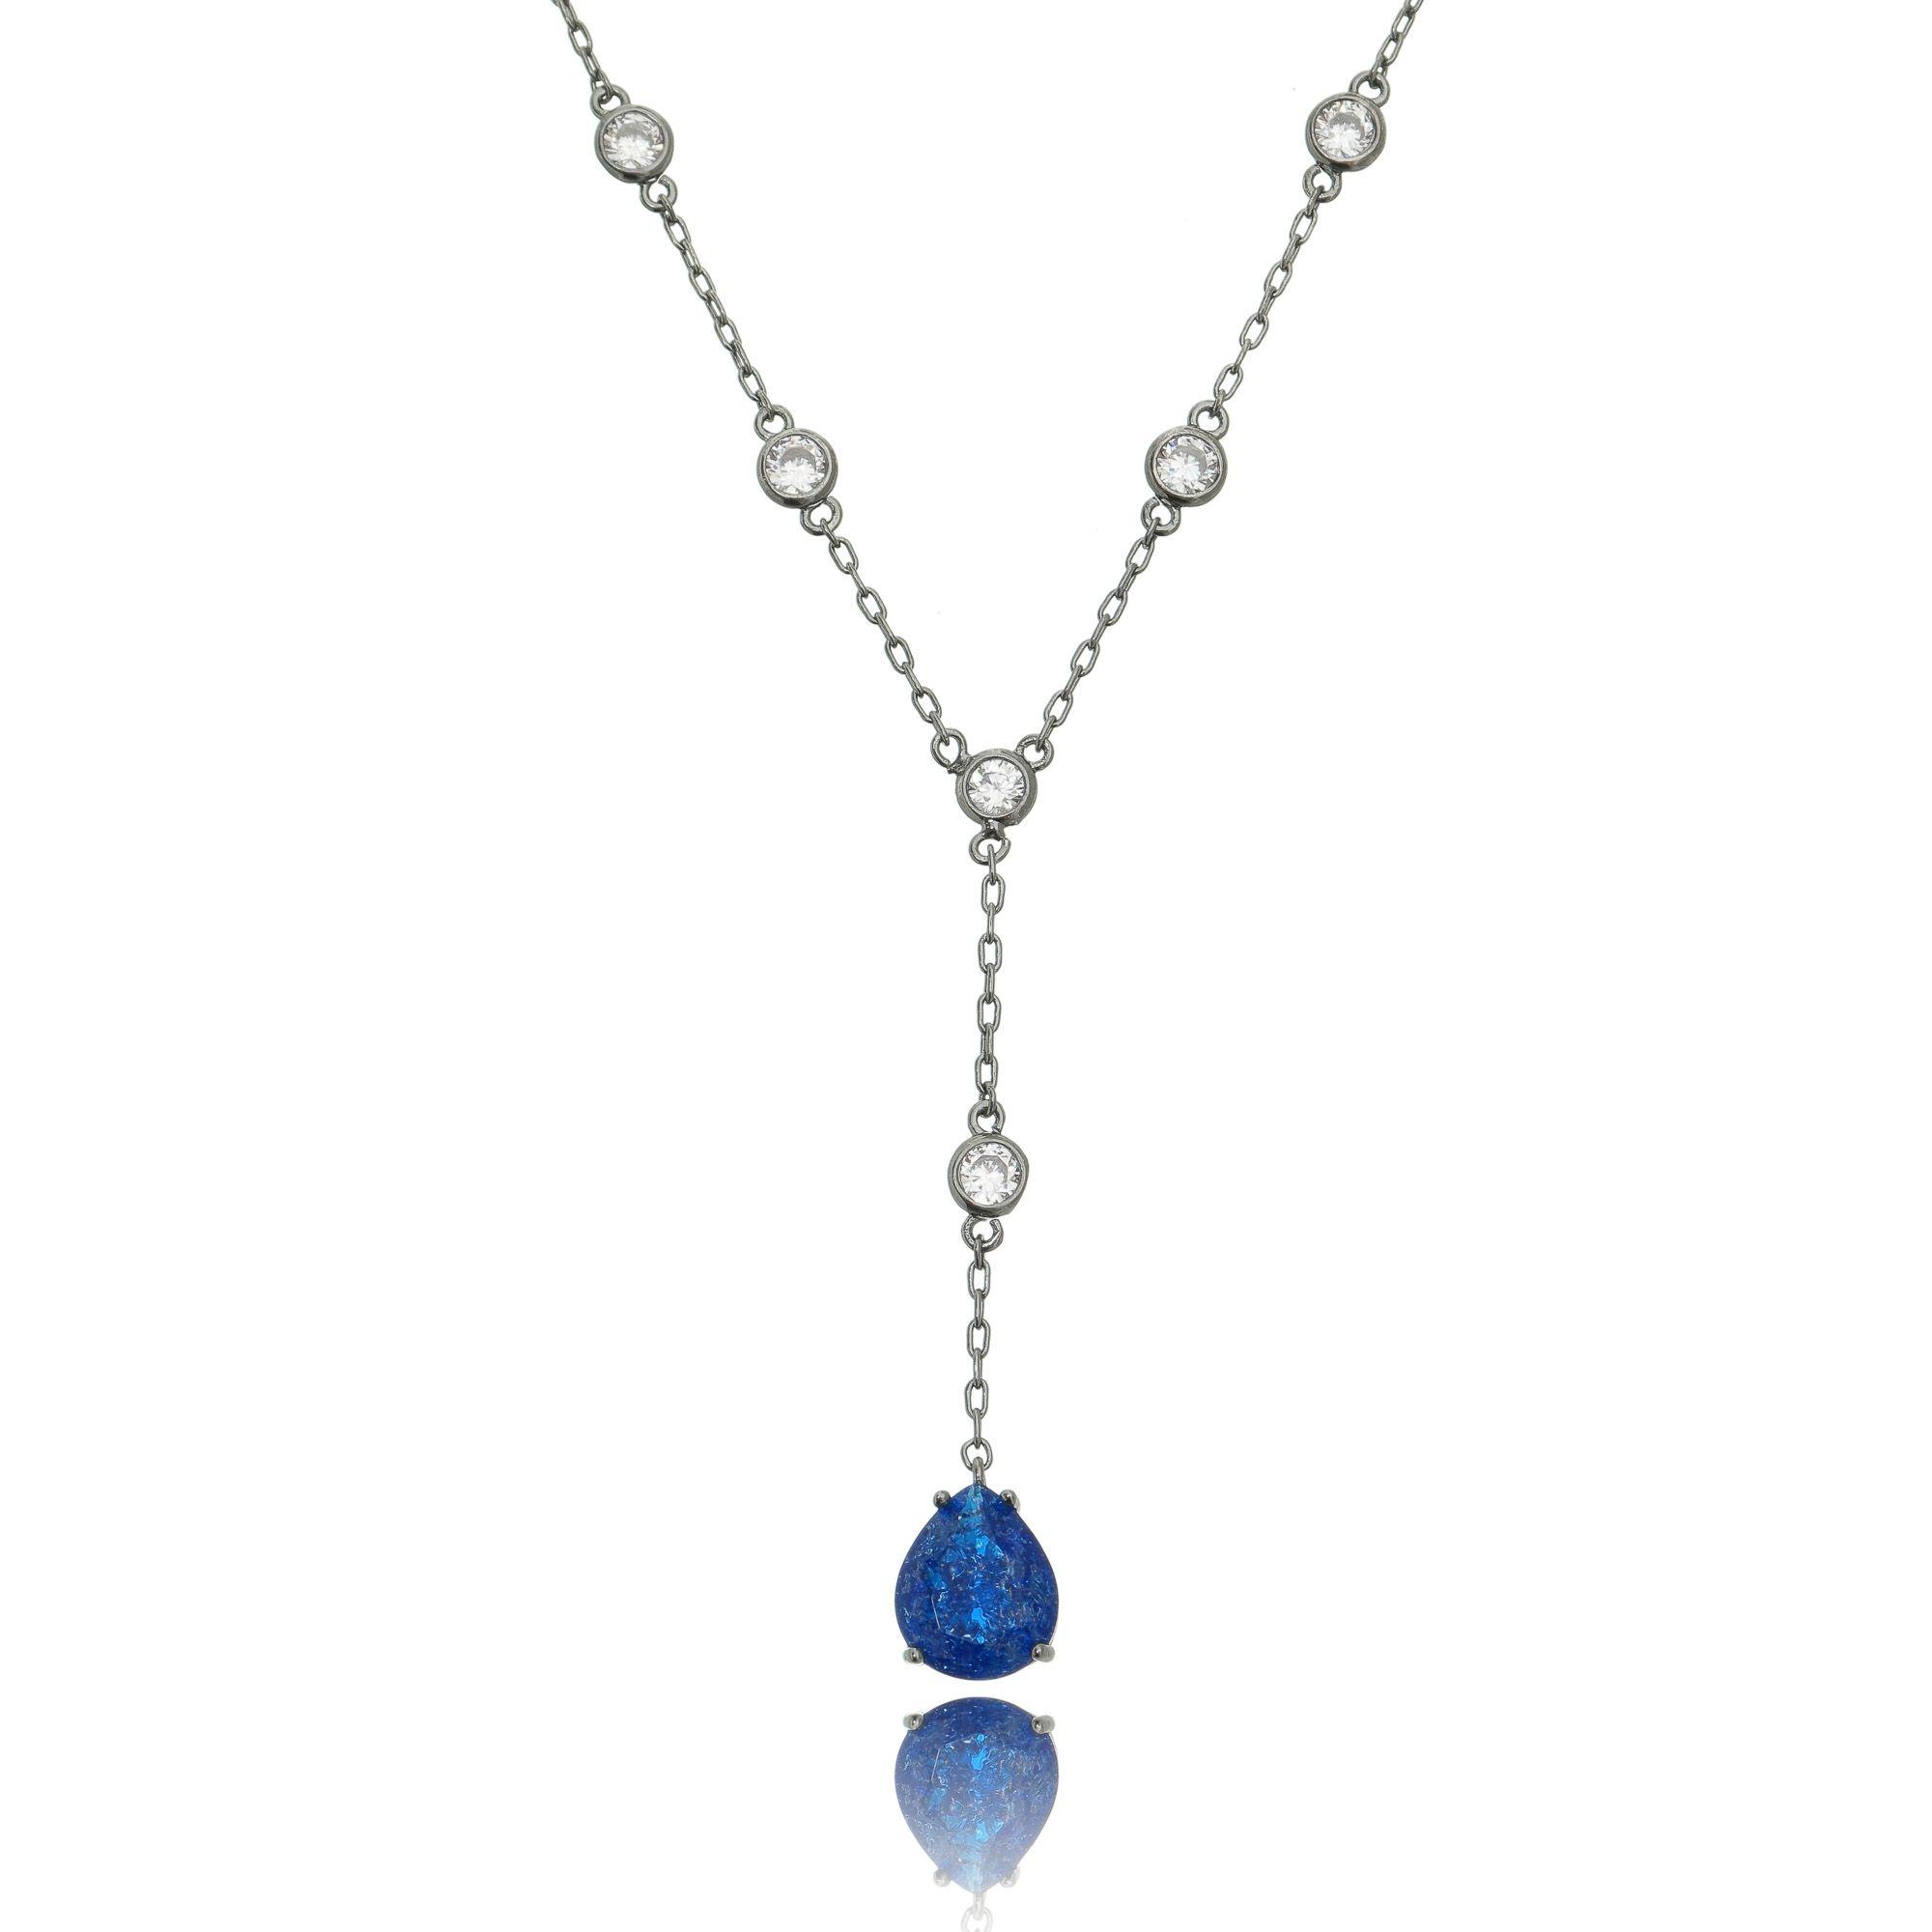 Colar Gravatinha Azul Safira Fusion e Zircônia Cristal Semijoia Luxo Ródio Negro  - Soloyou